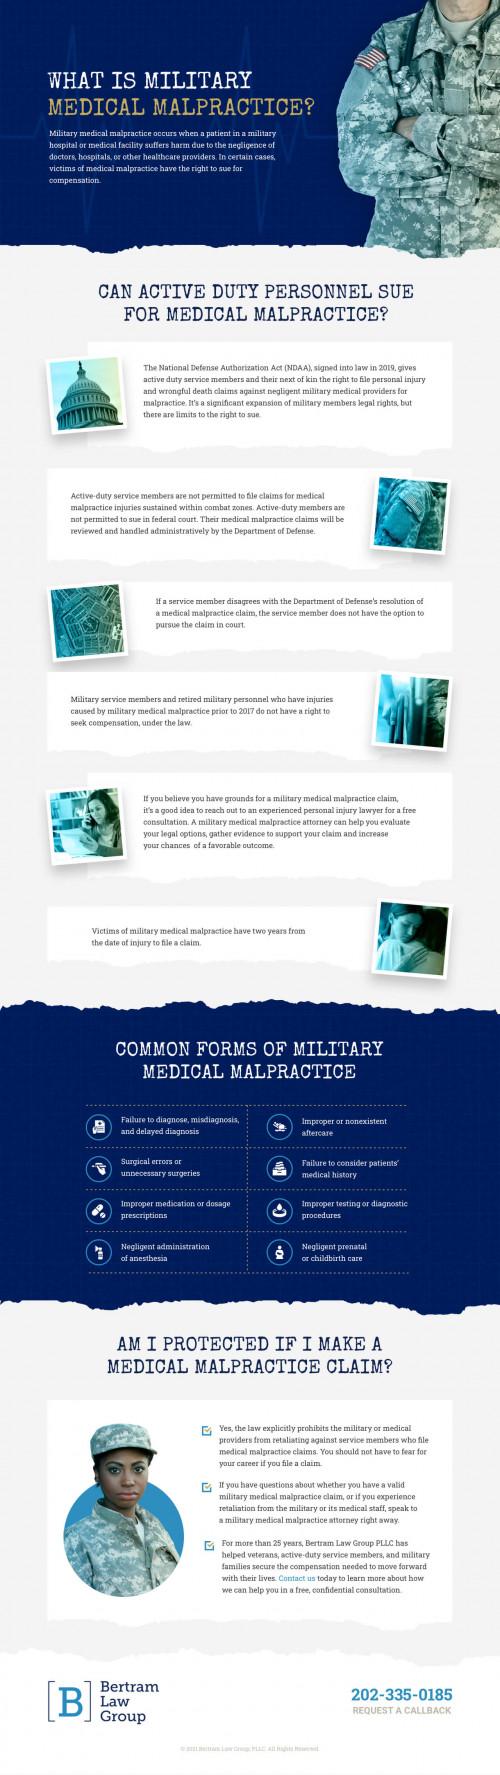 military-medical-malpractice-infographic-Bertnam-Law_Group.jpg